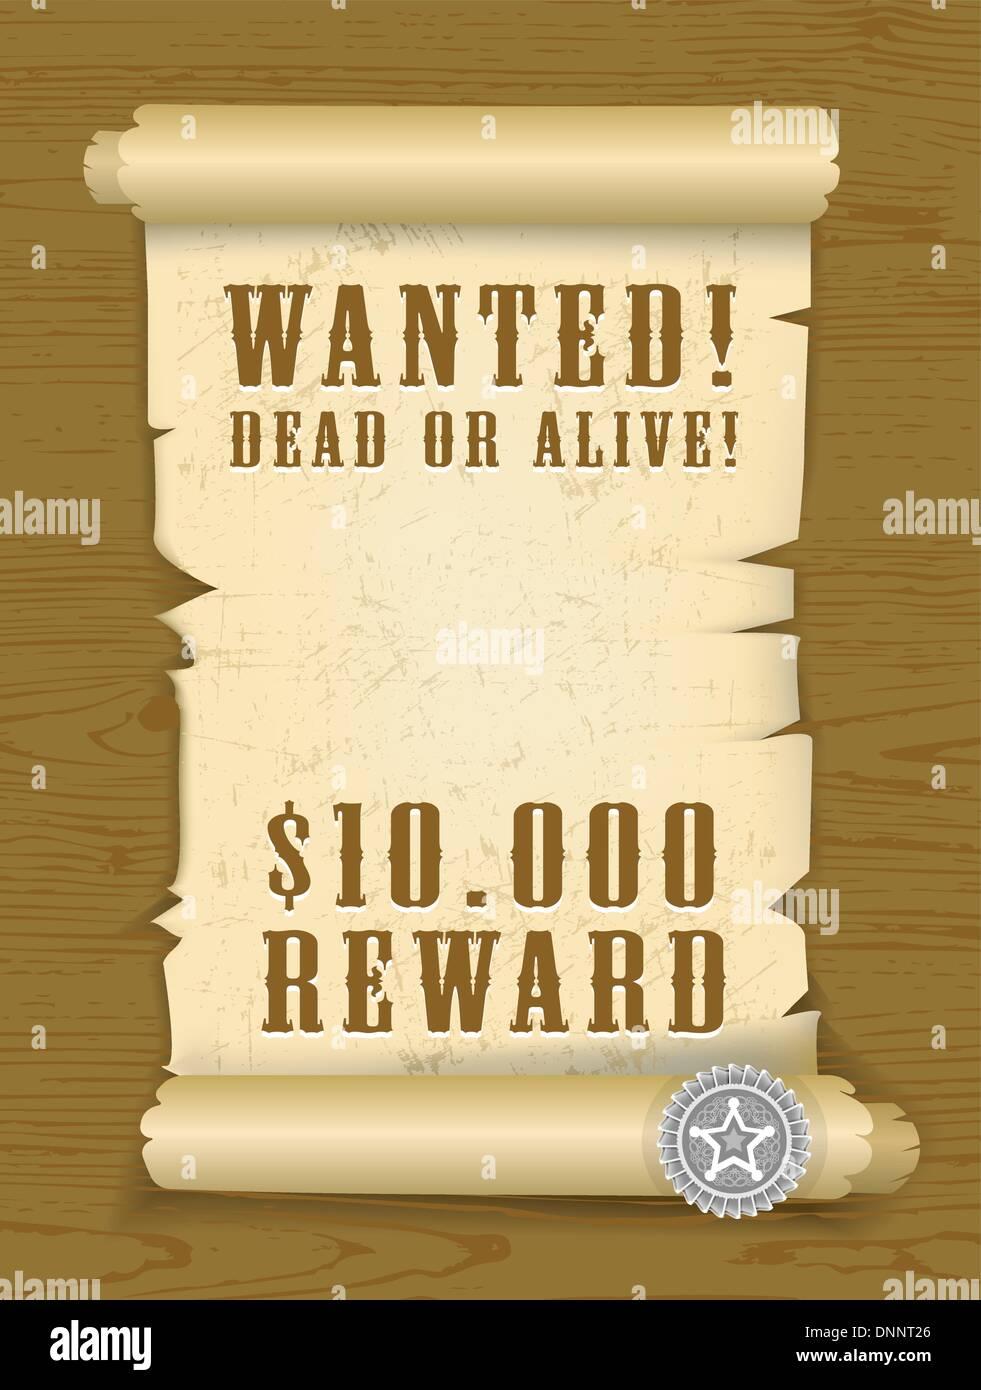 Vektor Plakat wollte, tot oder lebendig auf Holztextur Hintergrund. EPS v. 8.0 Stockbild